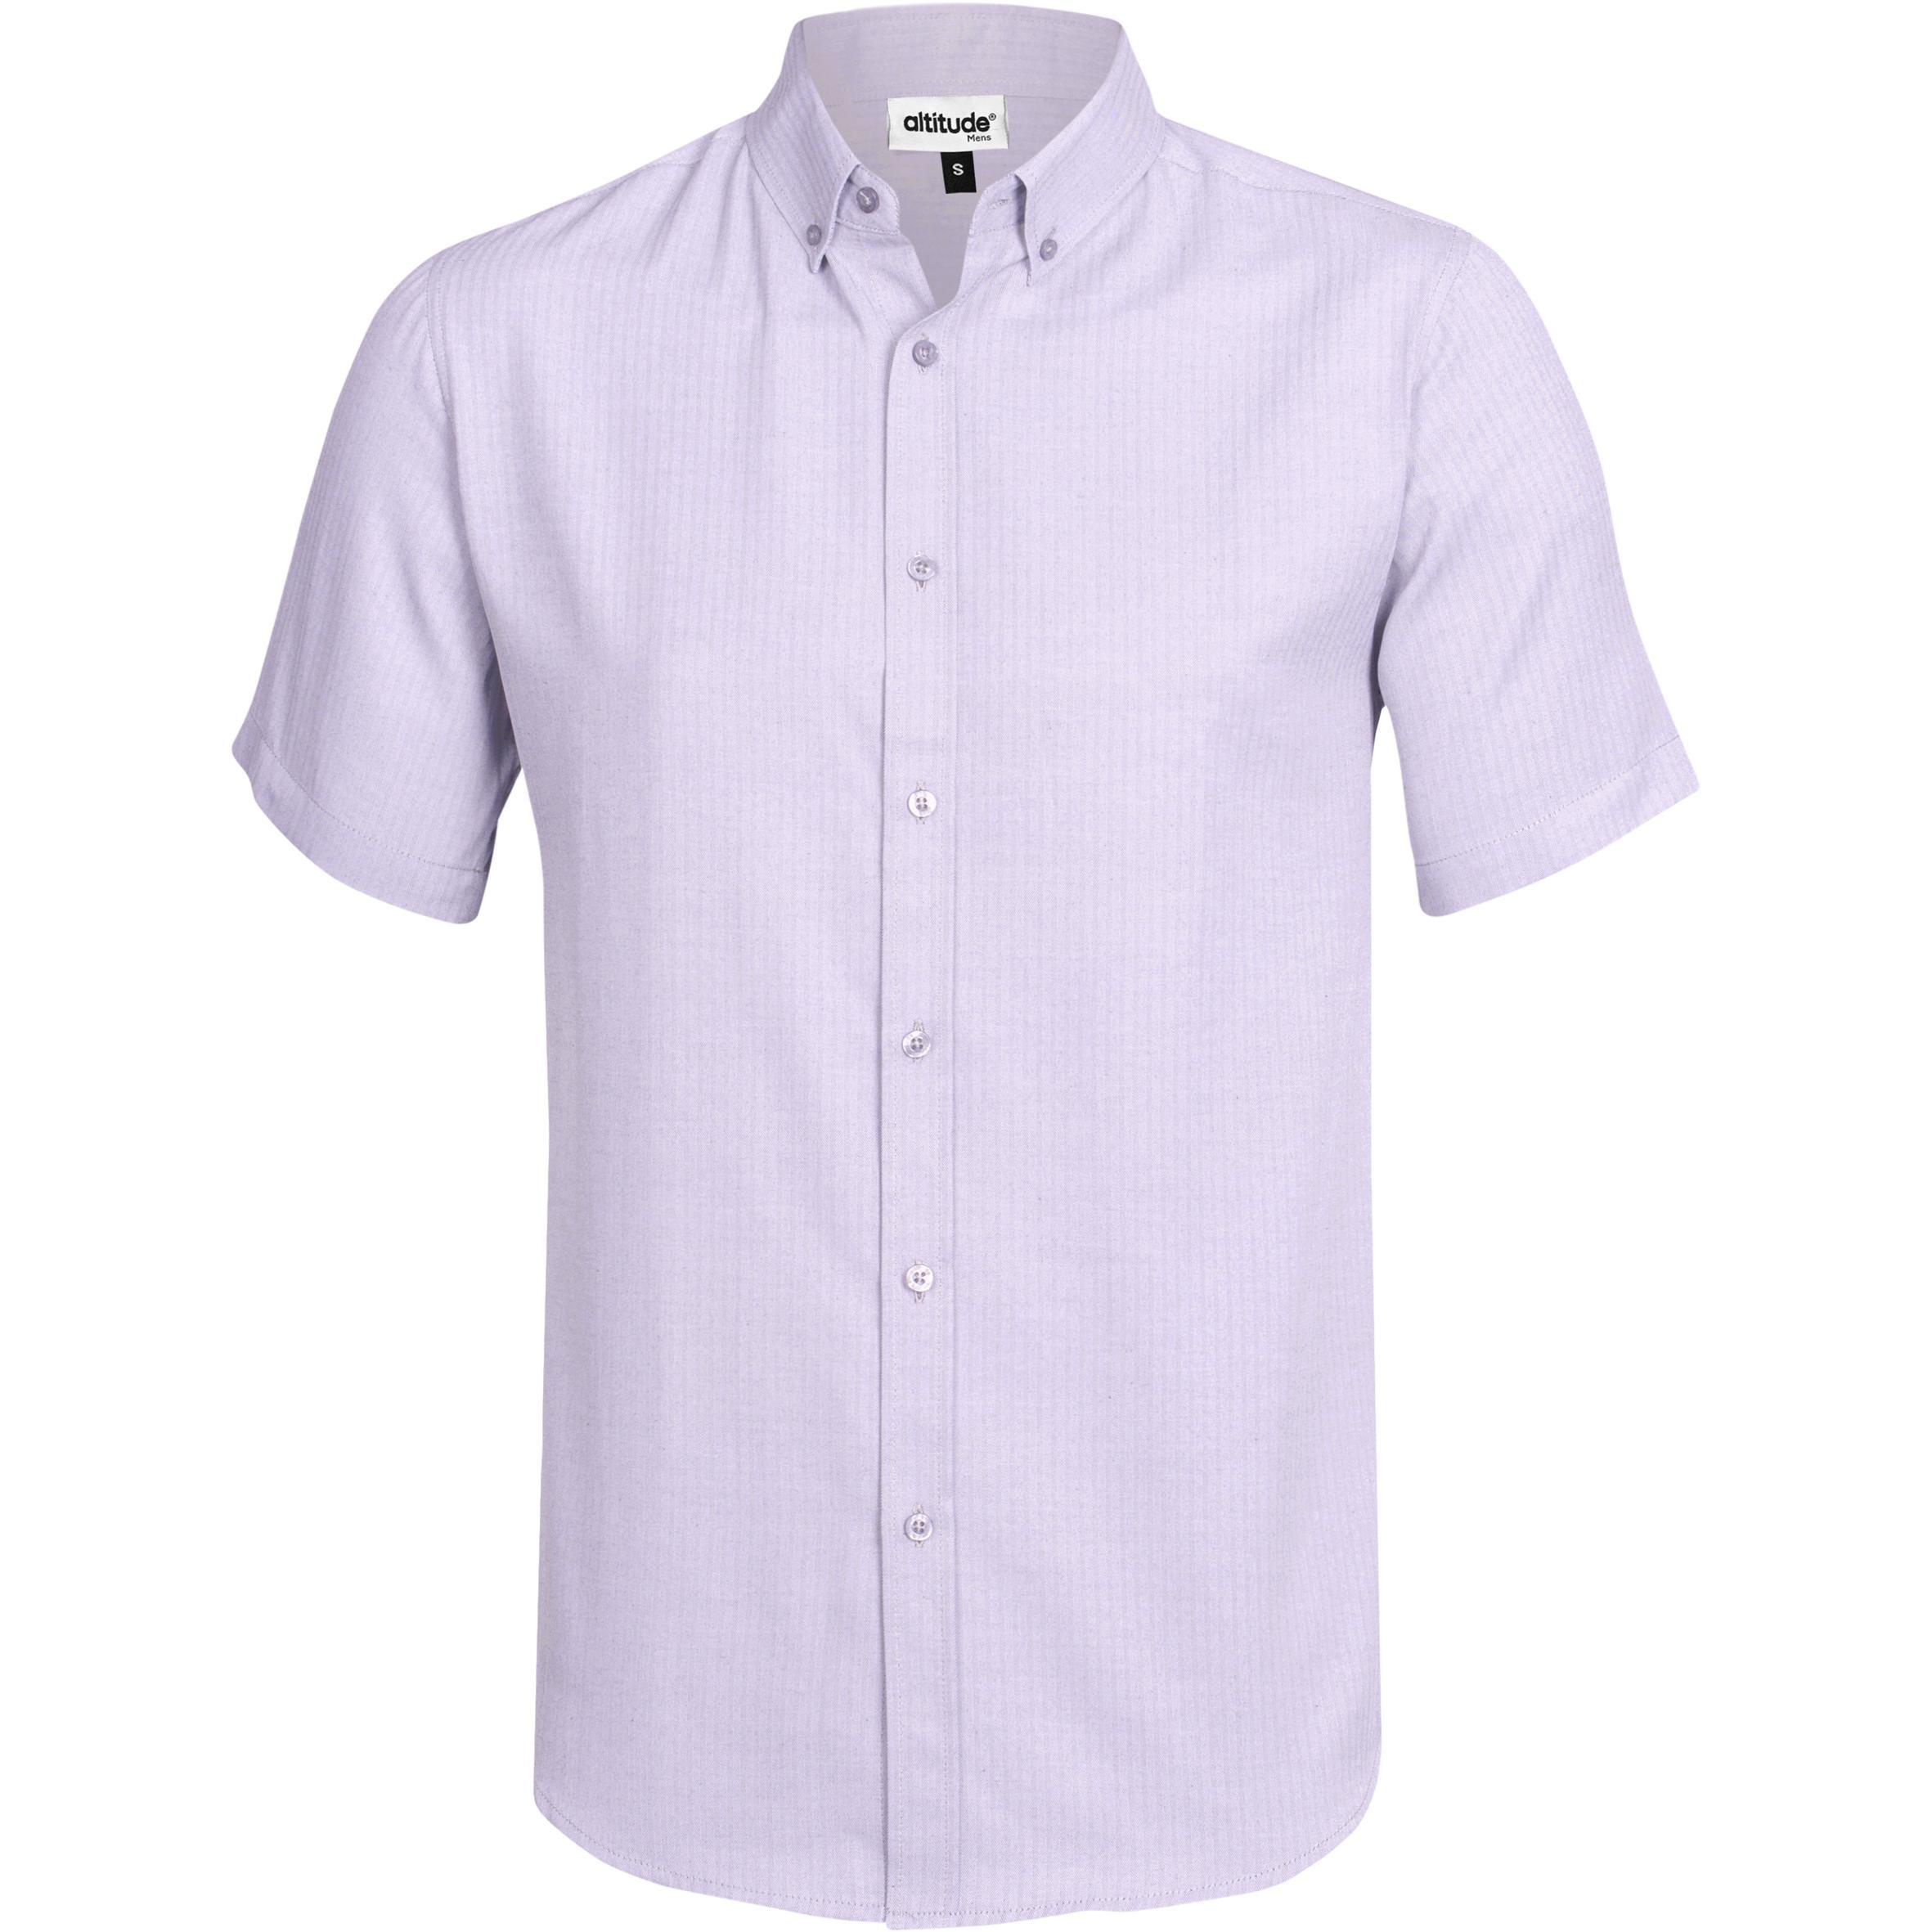 Mens Short Sleeve Nottingham Shirt - Purple Only